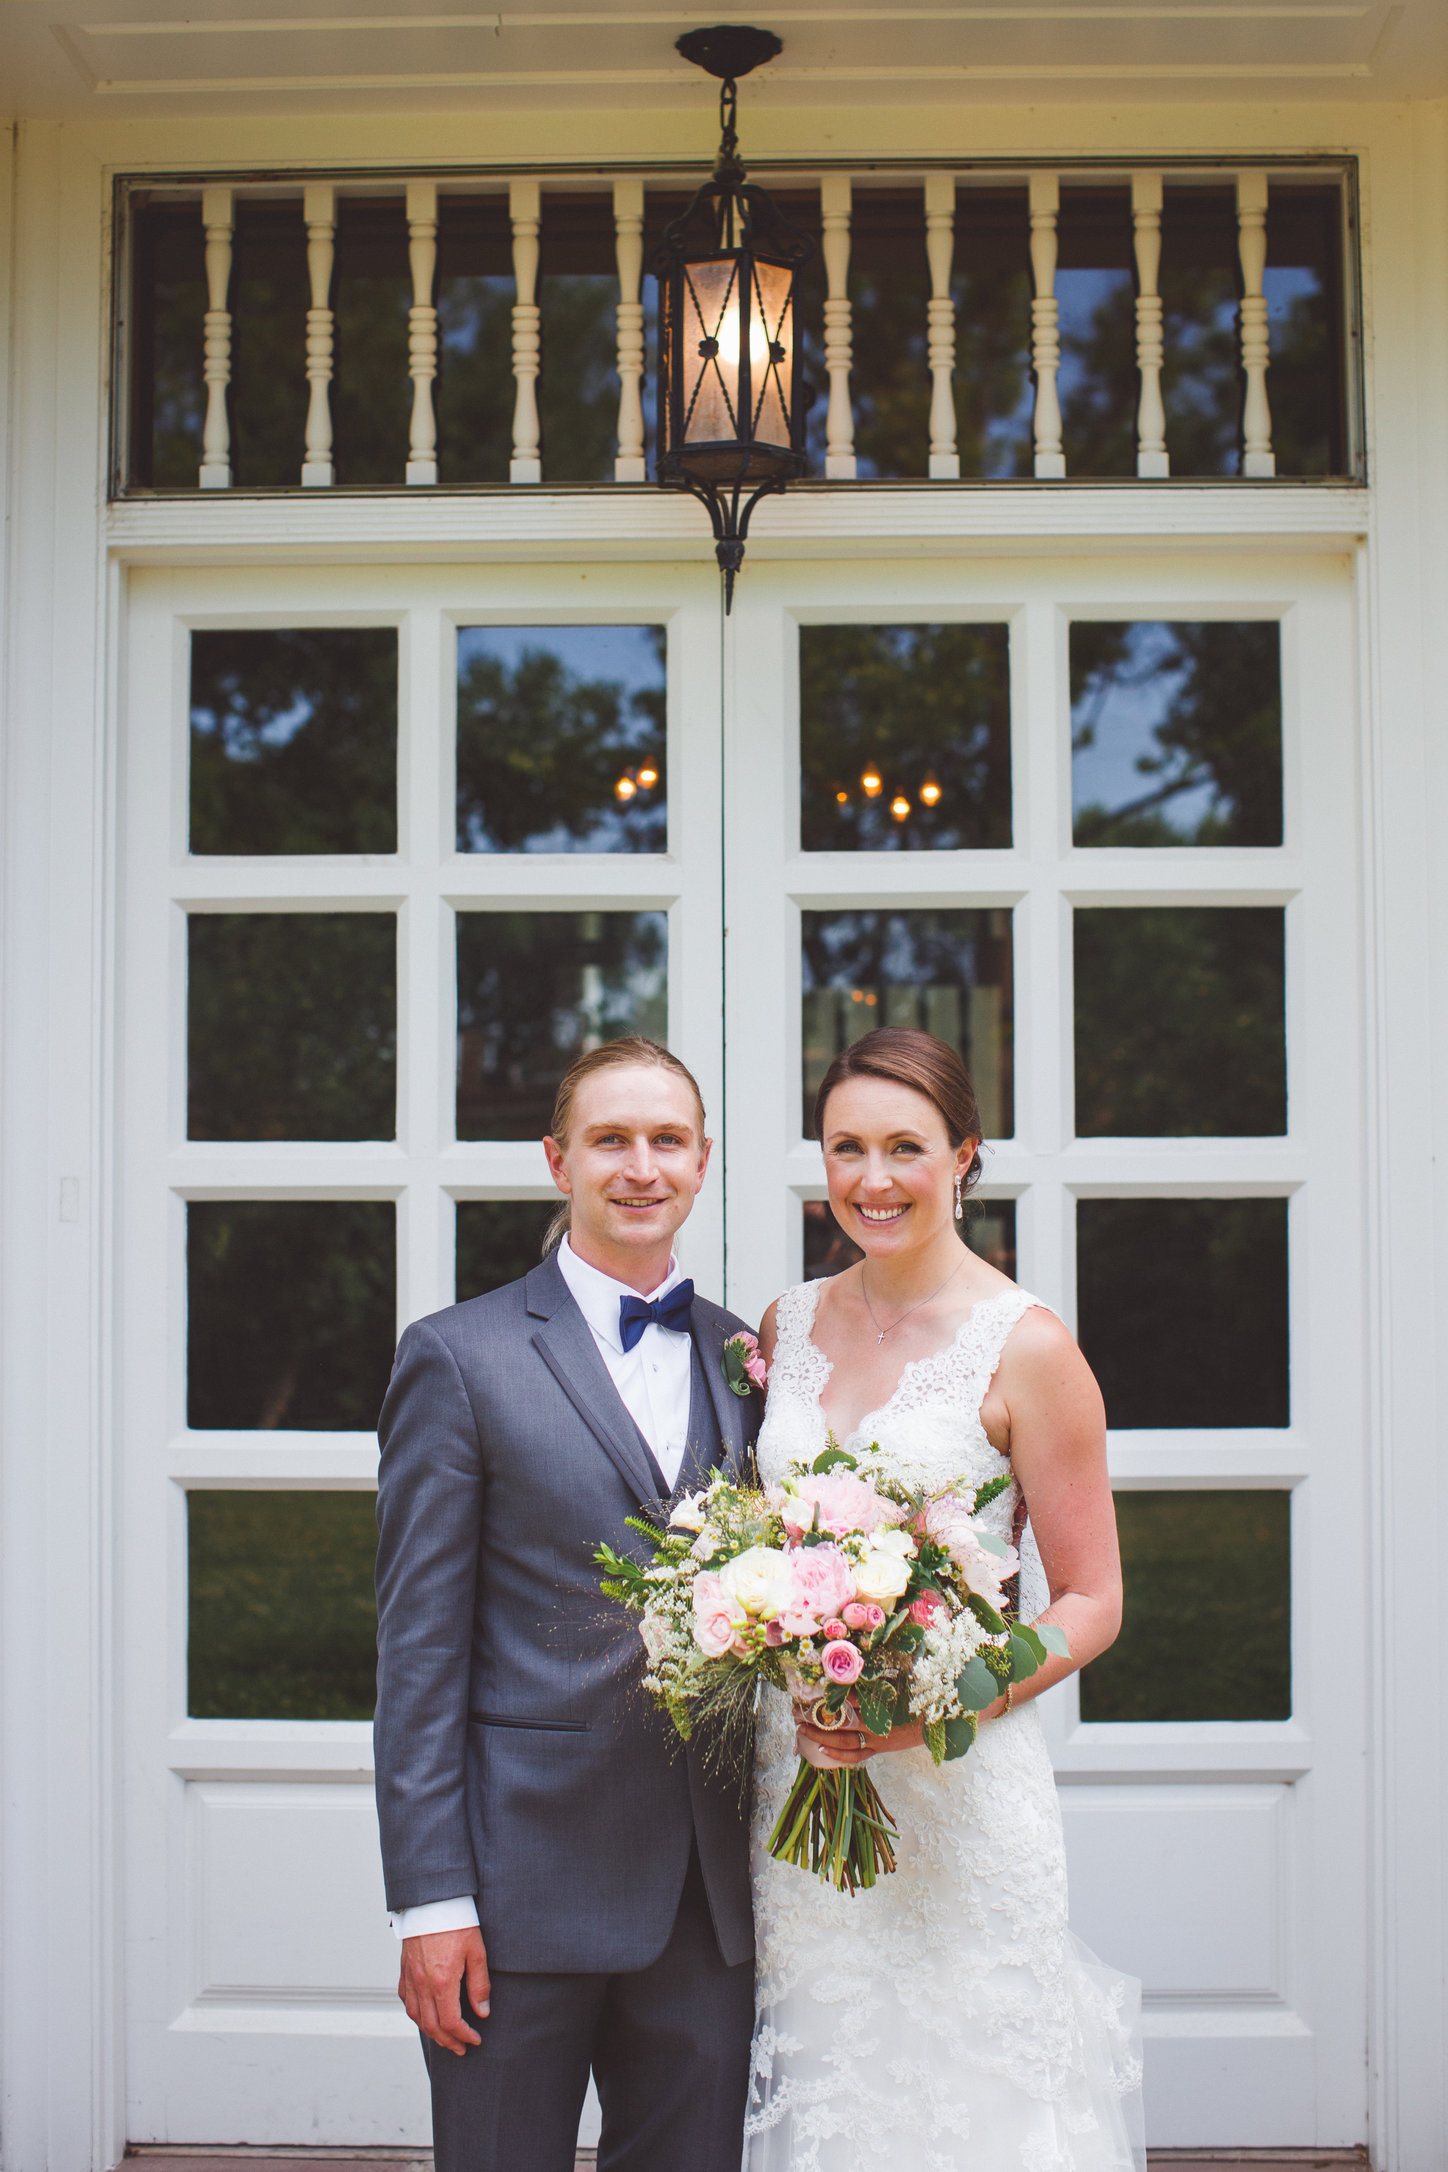 SandC-wedding-352.jpg